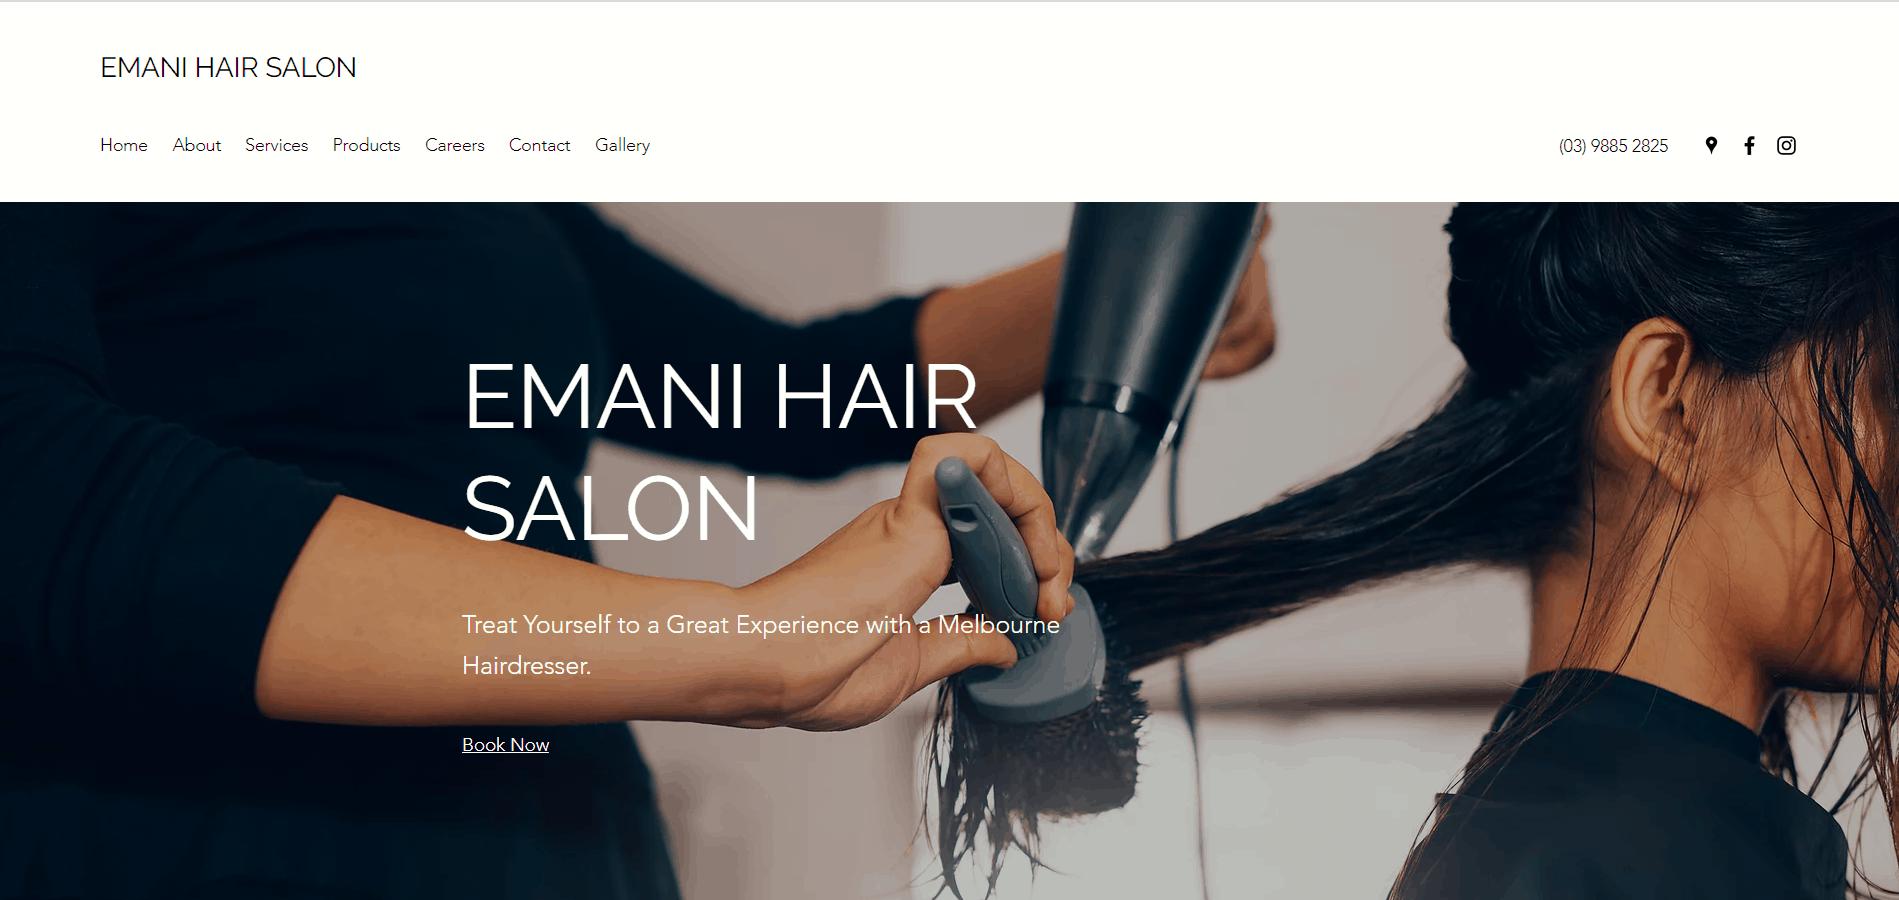 Emani Hair Salon